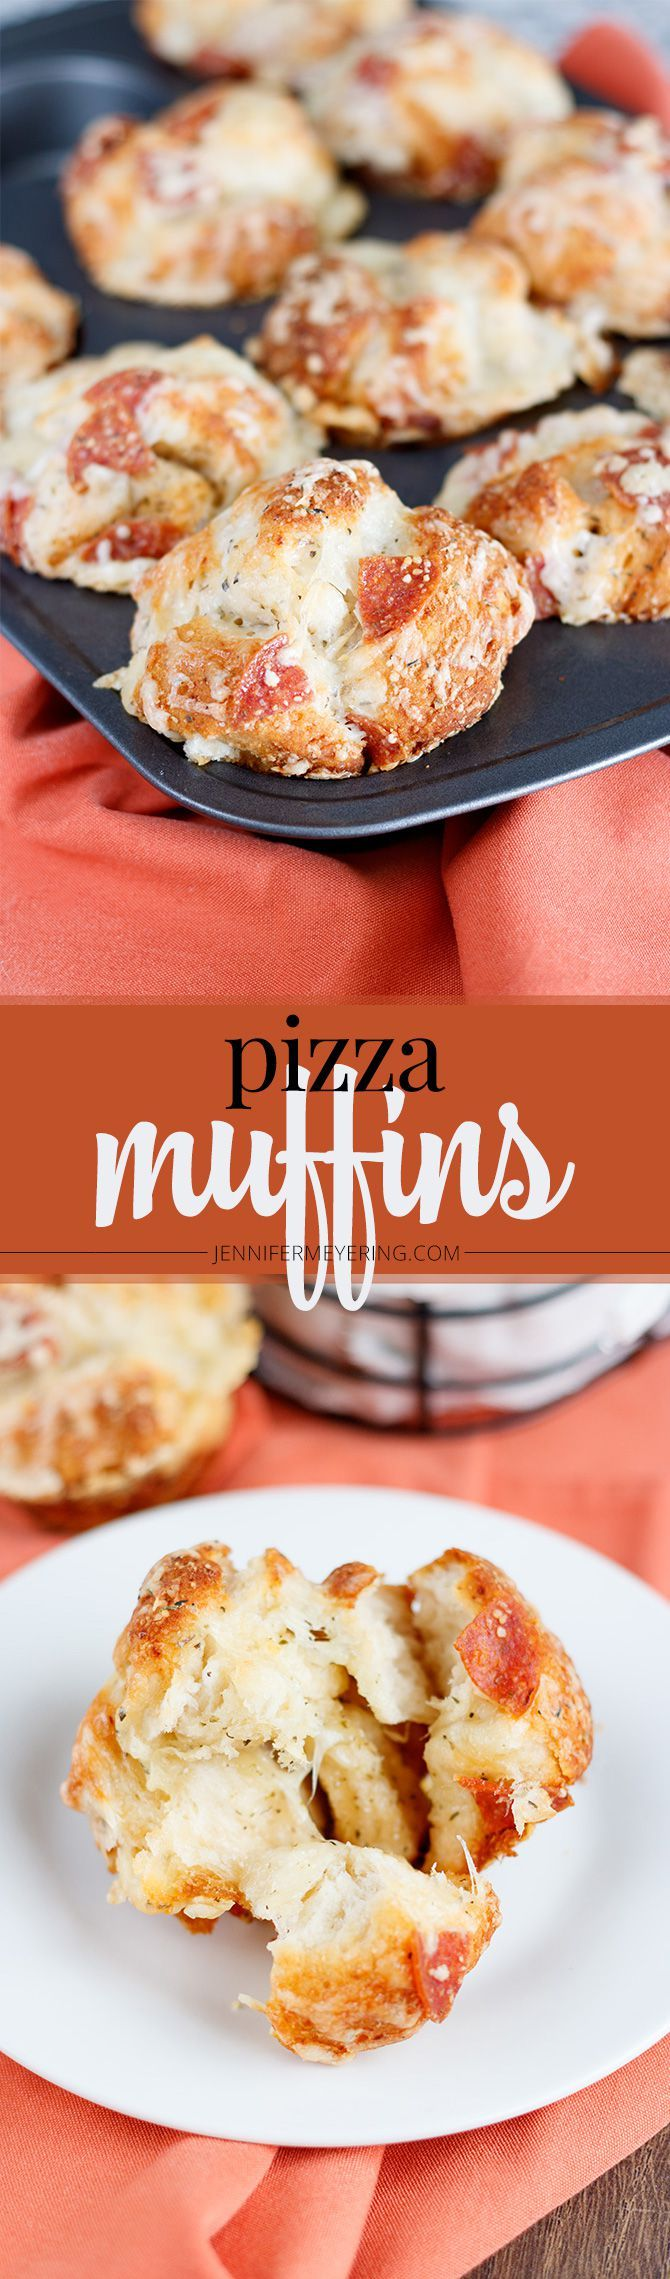 Pizza Muffins - JenniferMeyering.com